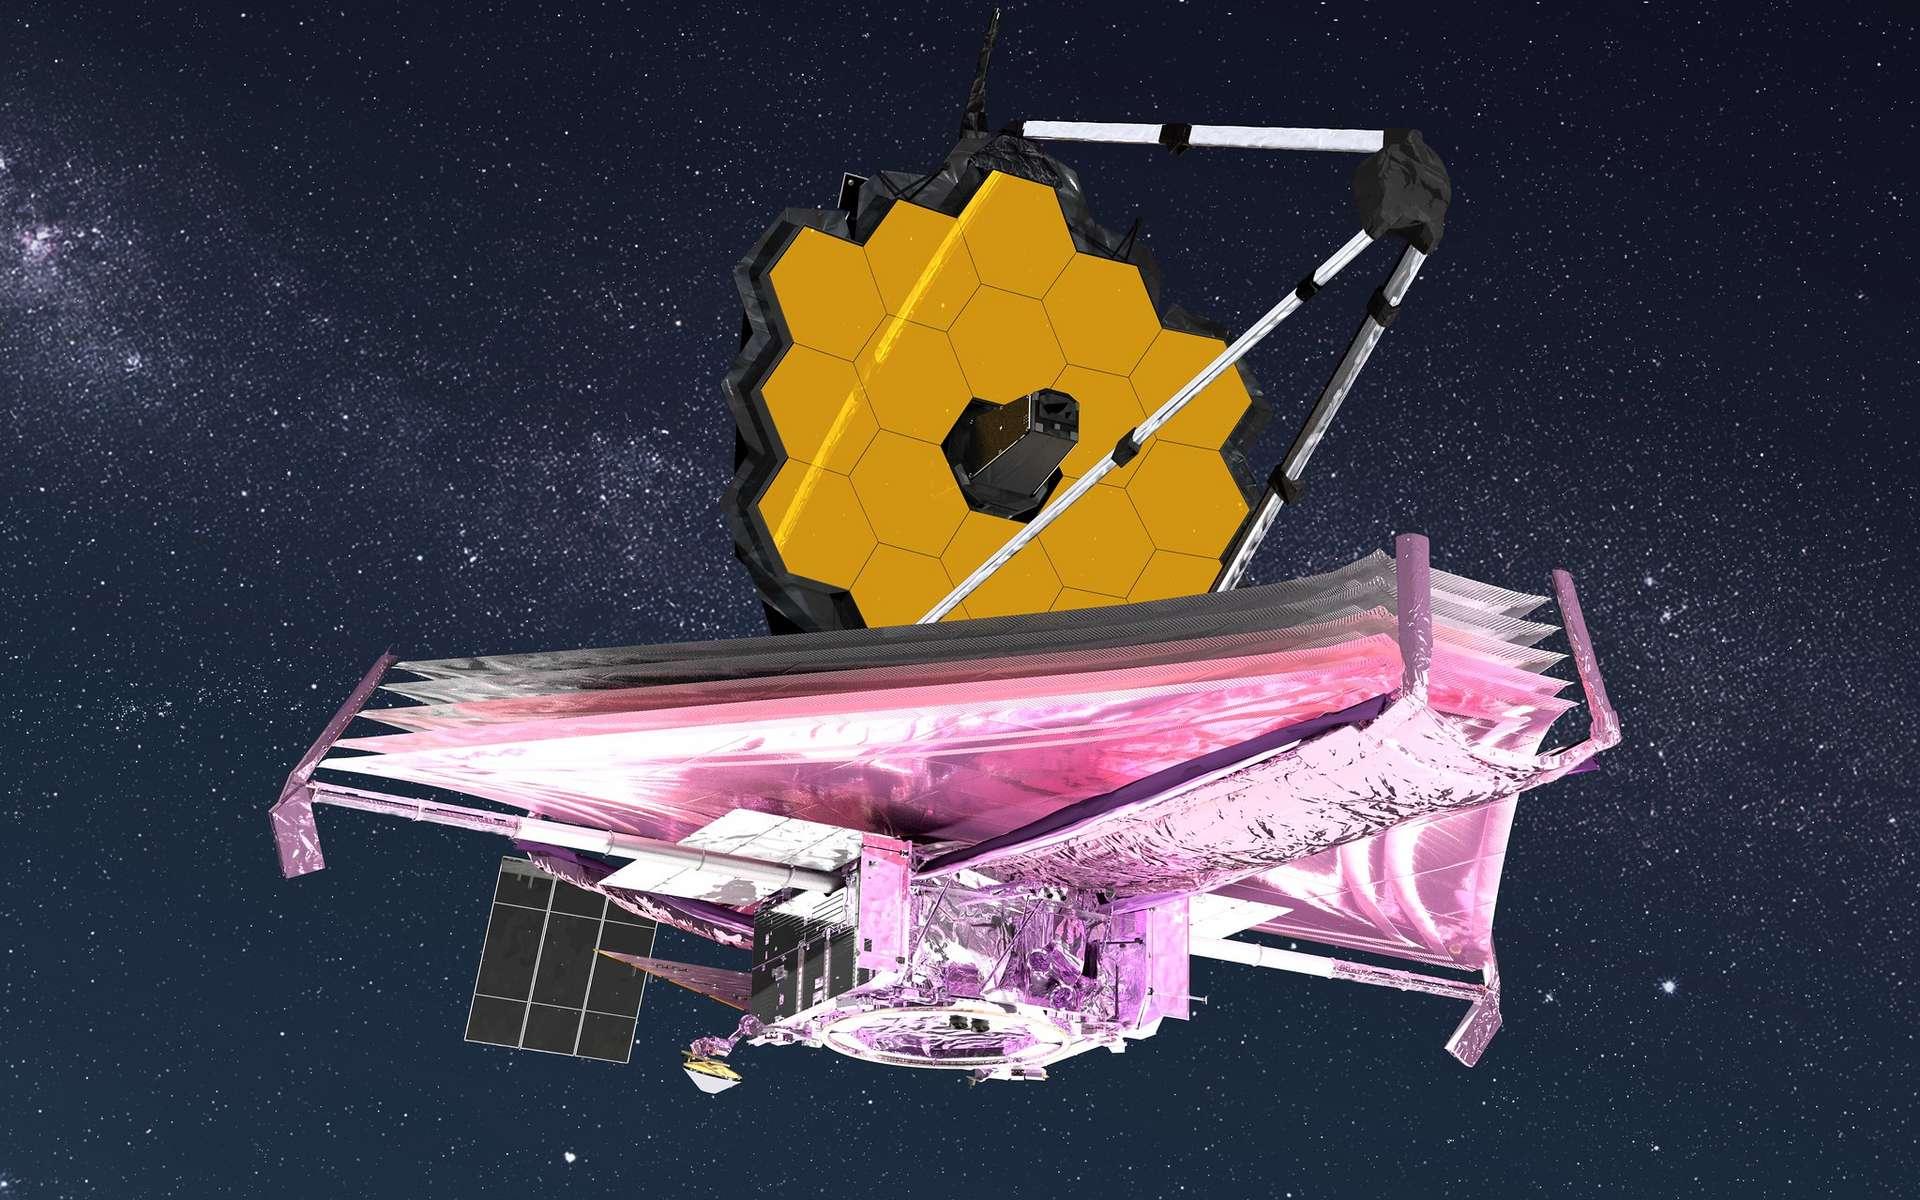 Illustration du grand télescope spatial James Webb. © Nasa GSFC, CIL, Adriana Manrique Gutierrez